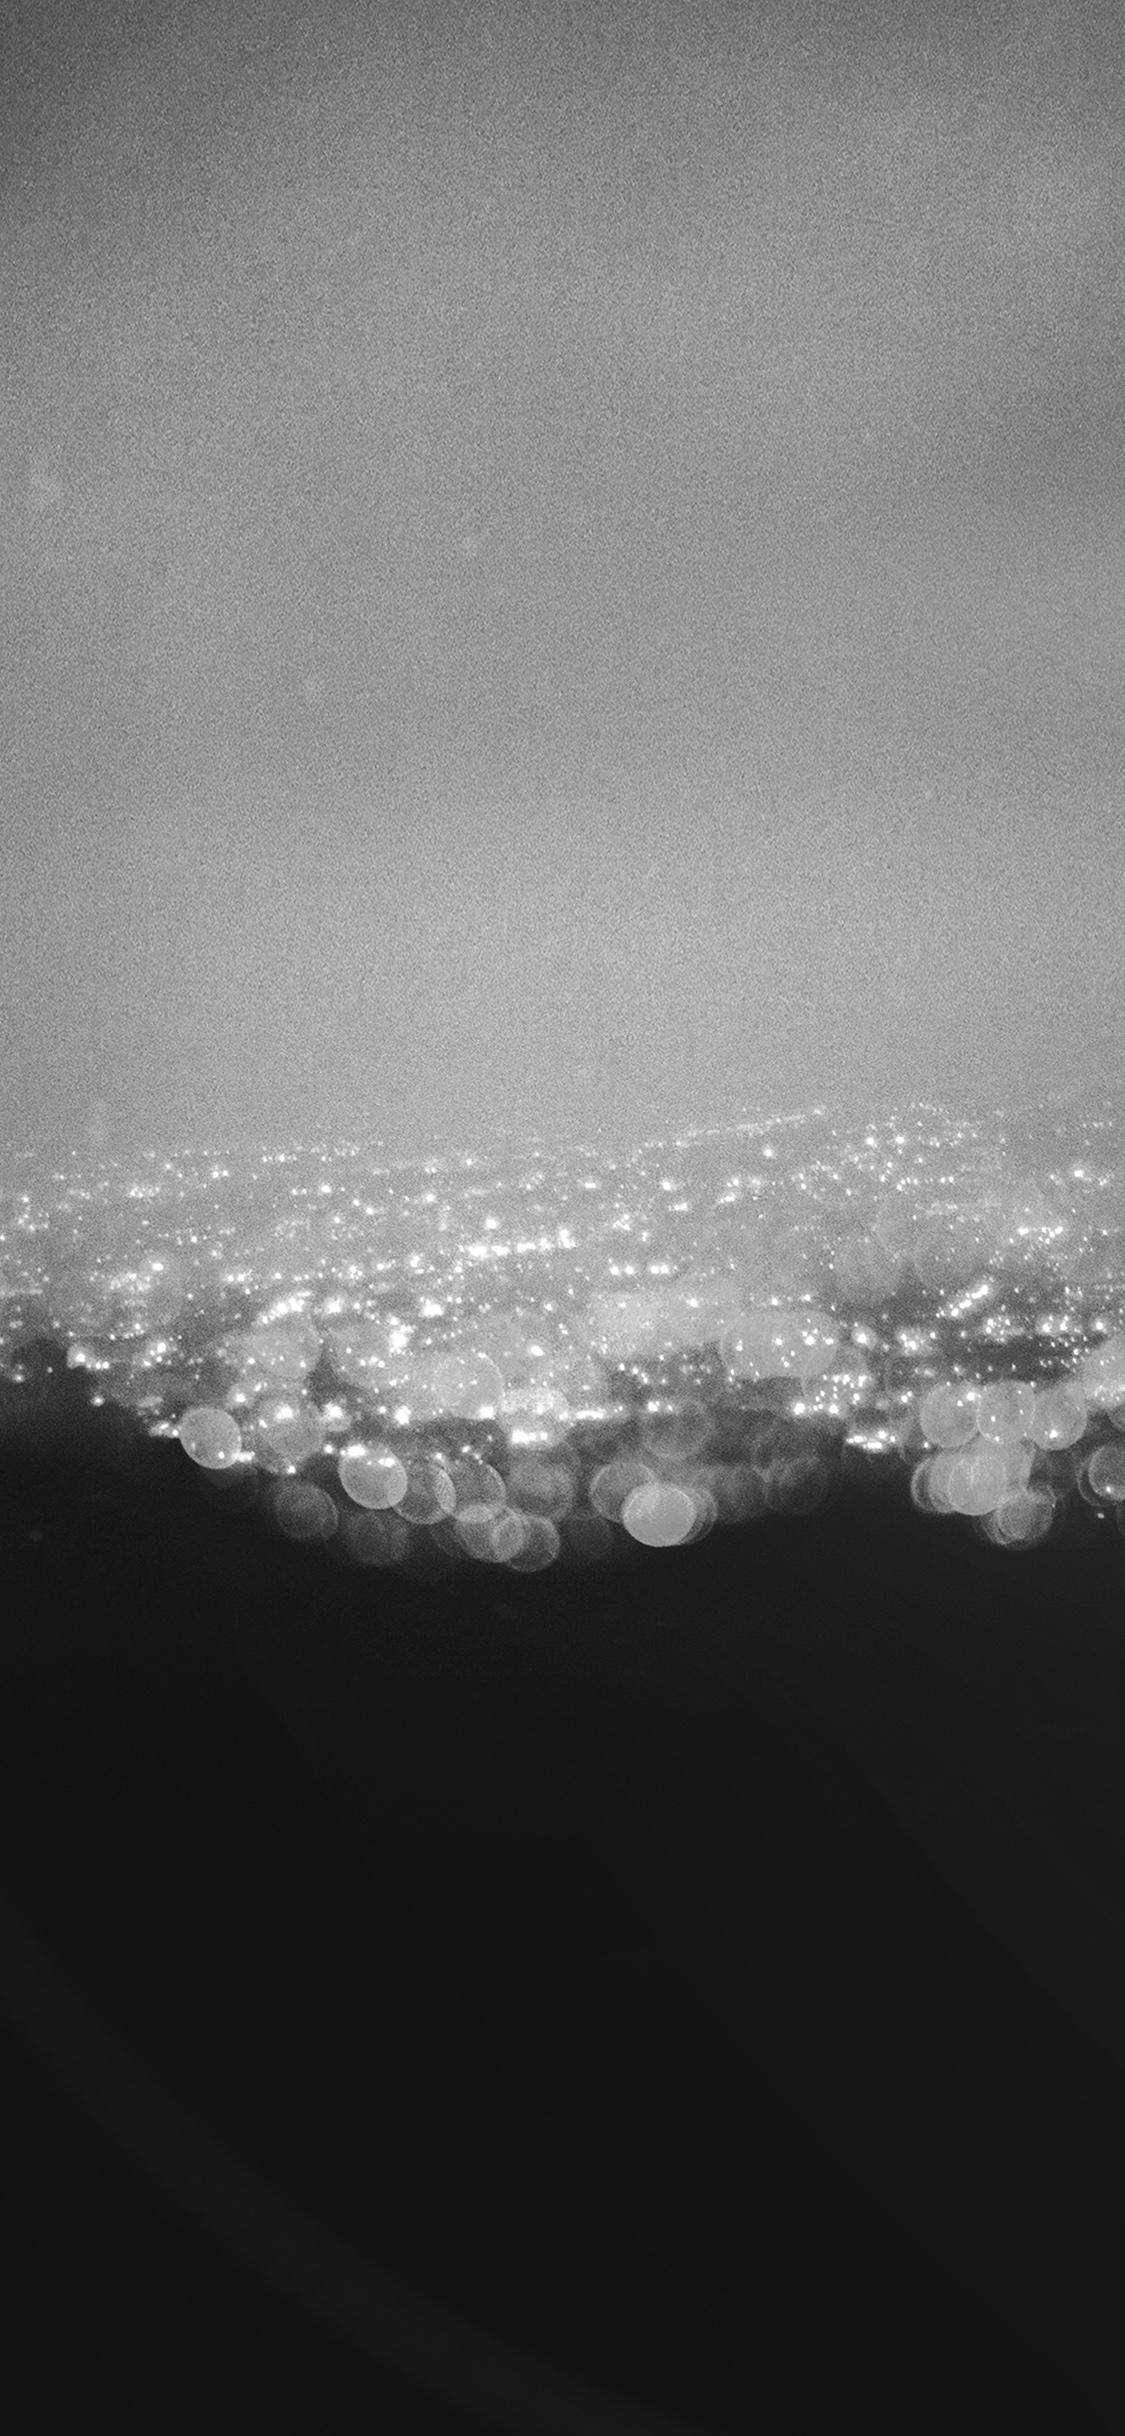 iPhonexpapers.com-Apple-iPhone-wallpaper-mq73-bokeh-night-city-view-lights-dark